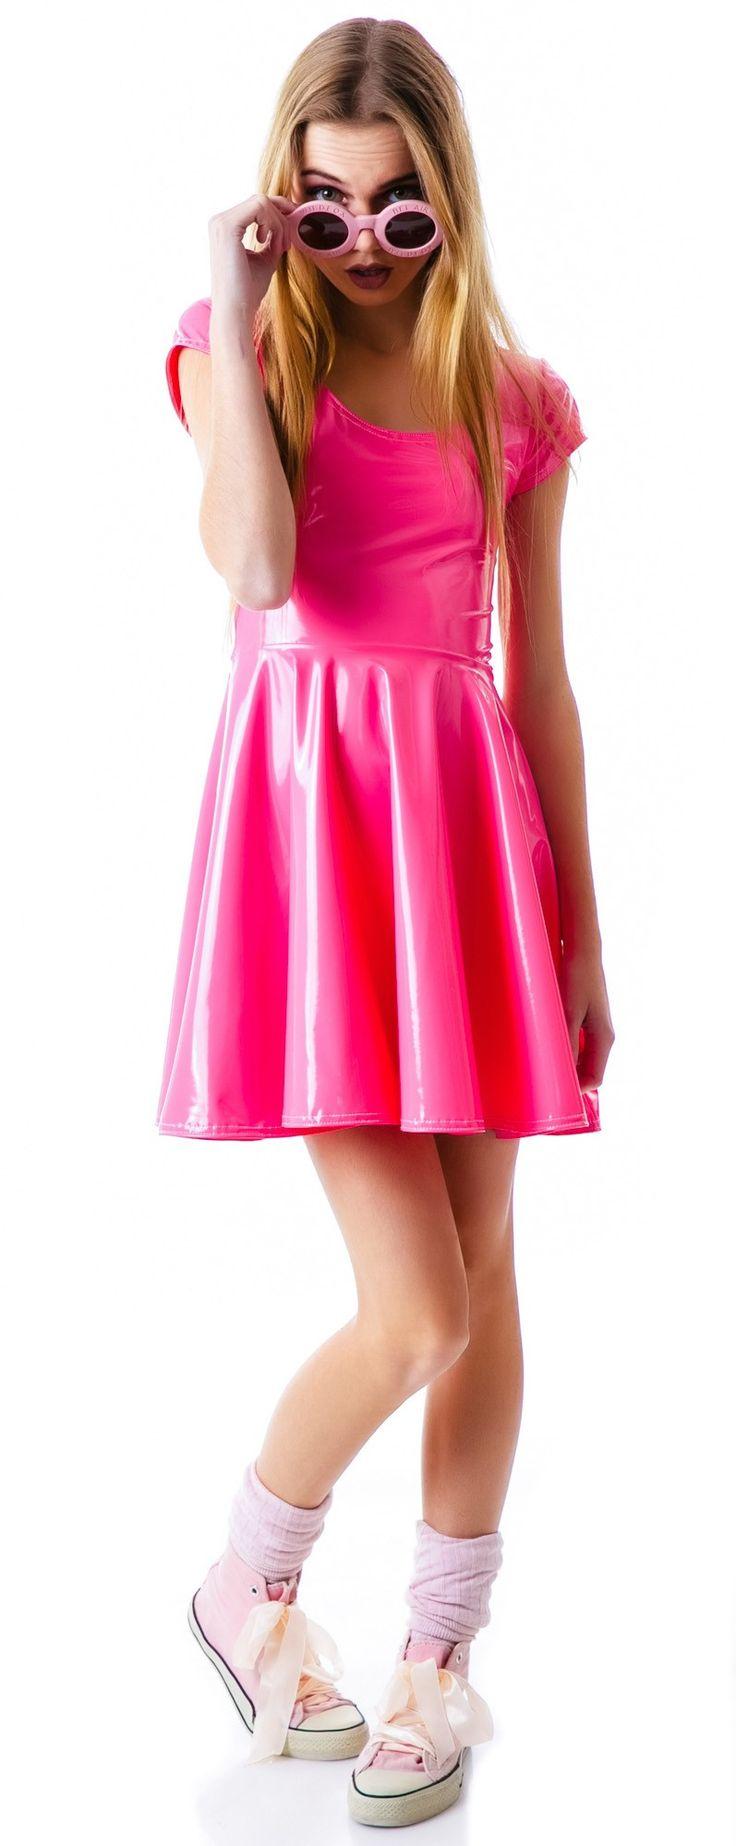 DEVOWEVO Bubblicious Skater #Dress #pink